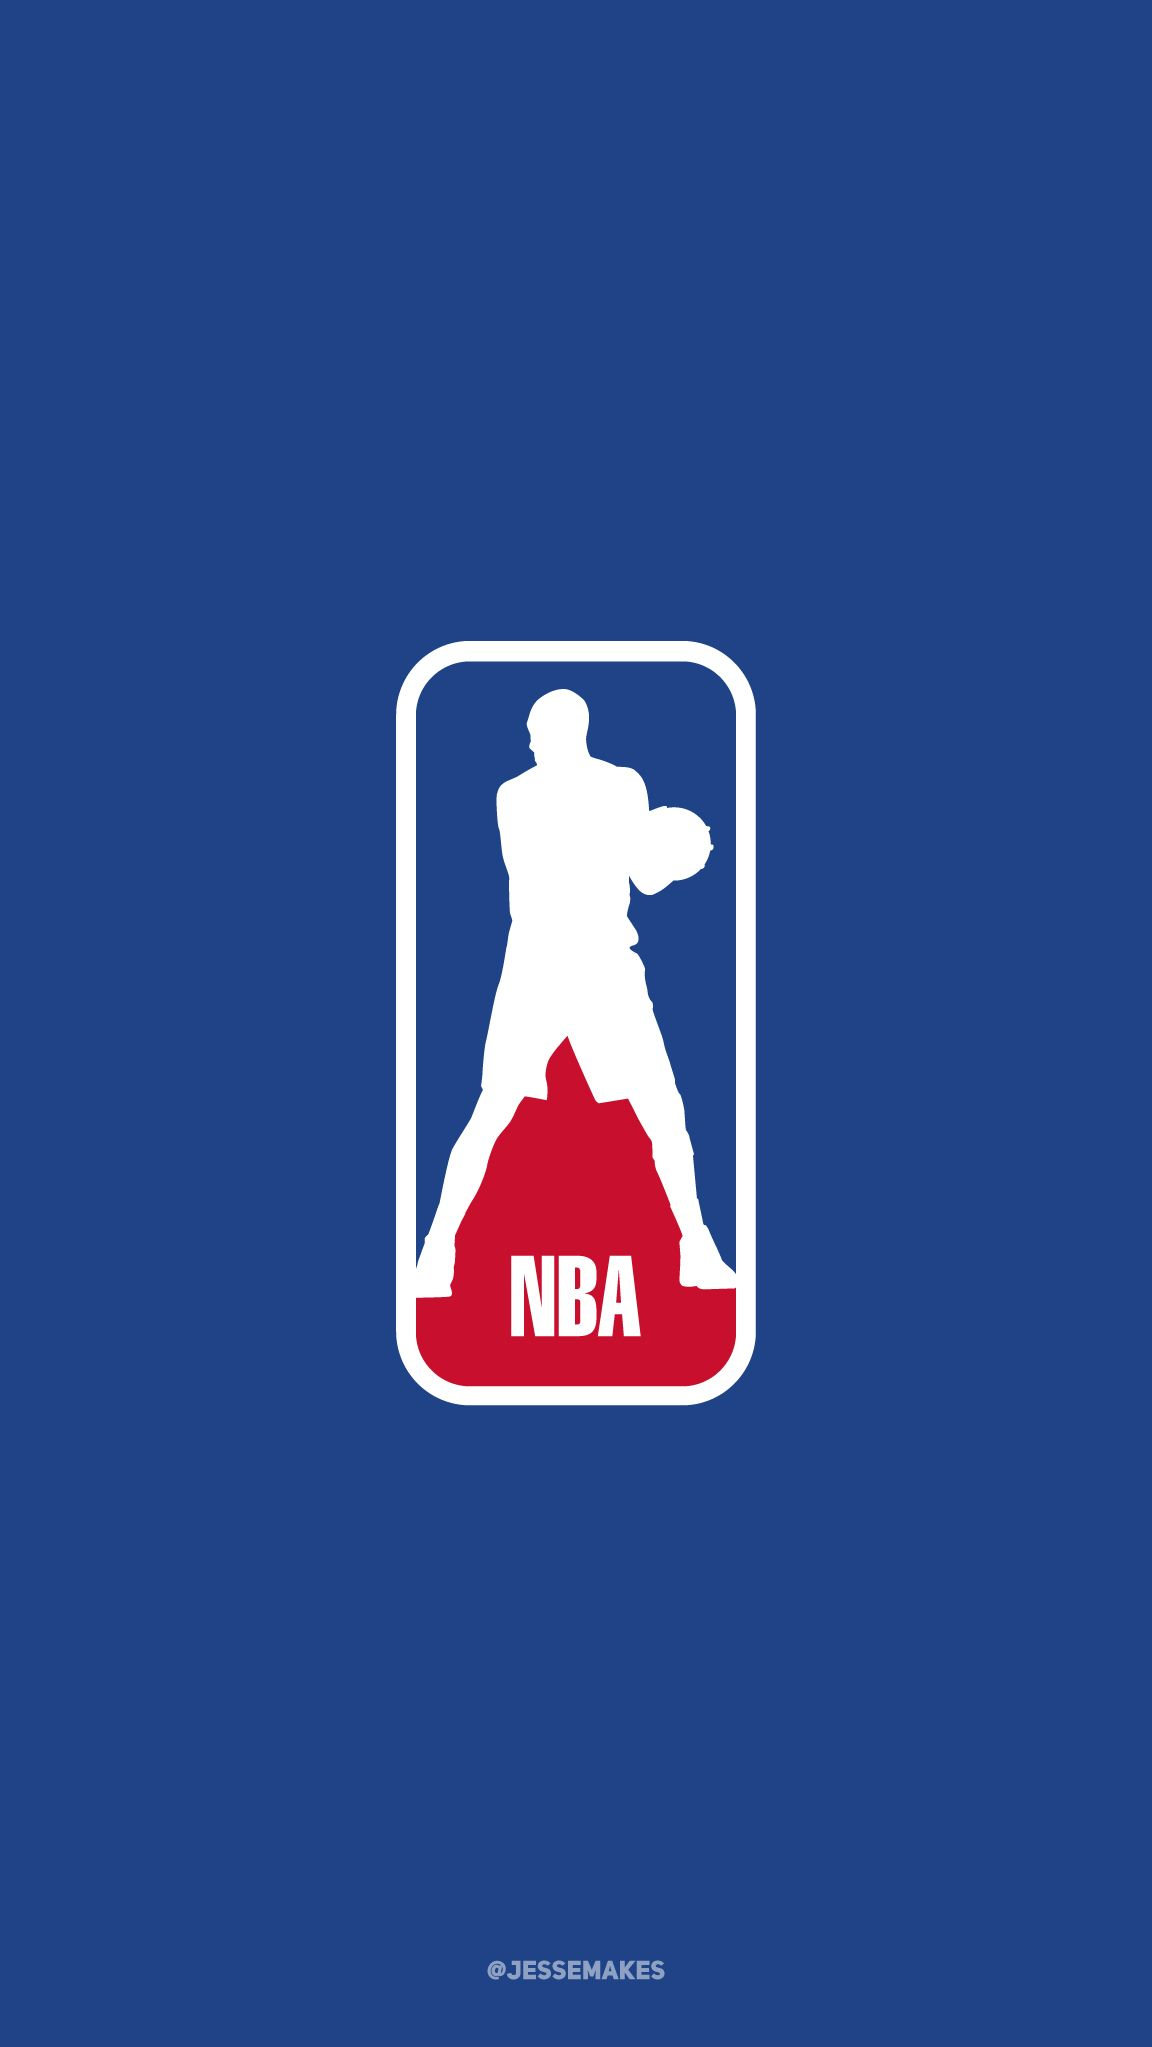 Tim Duncan As The Nba Logo Nba Logo Nba Nba Wallpapers